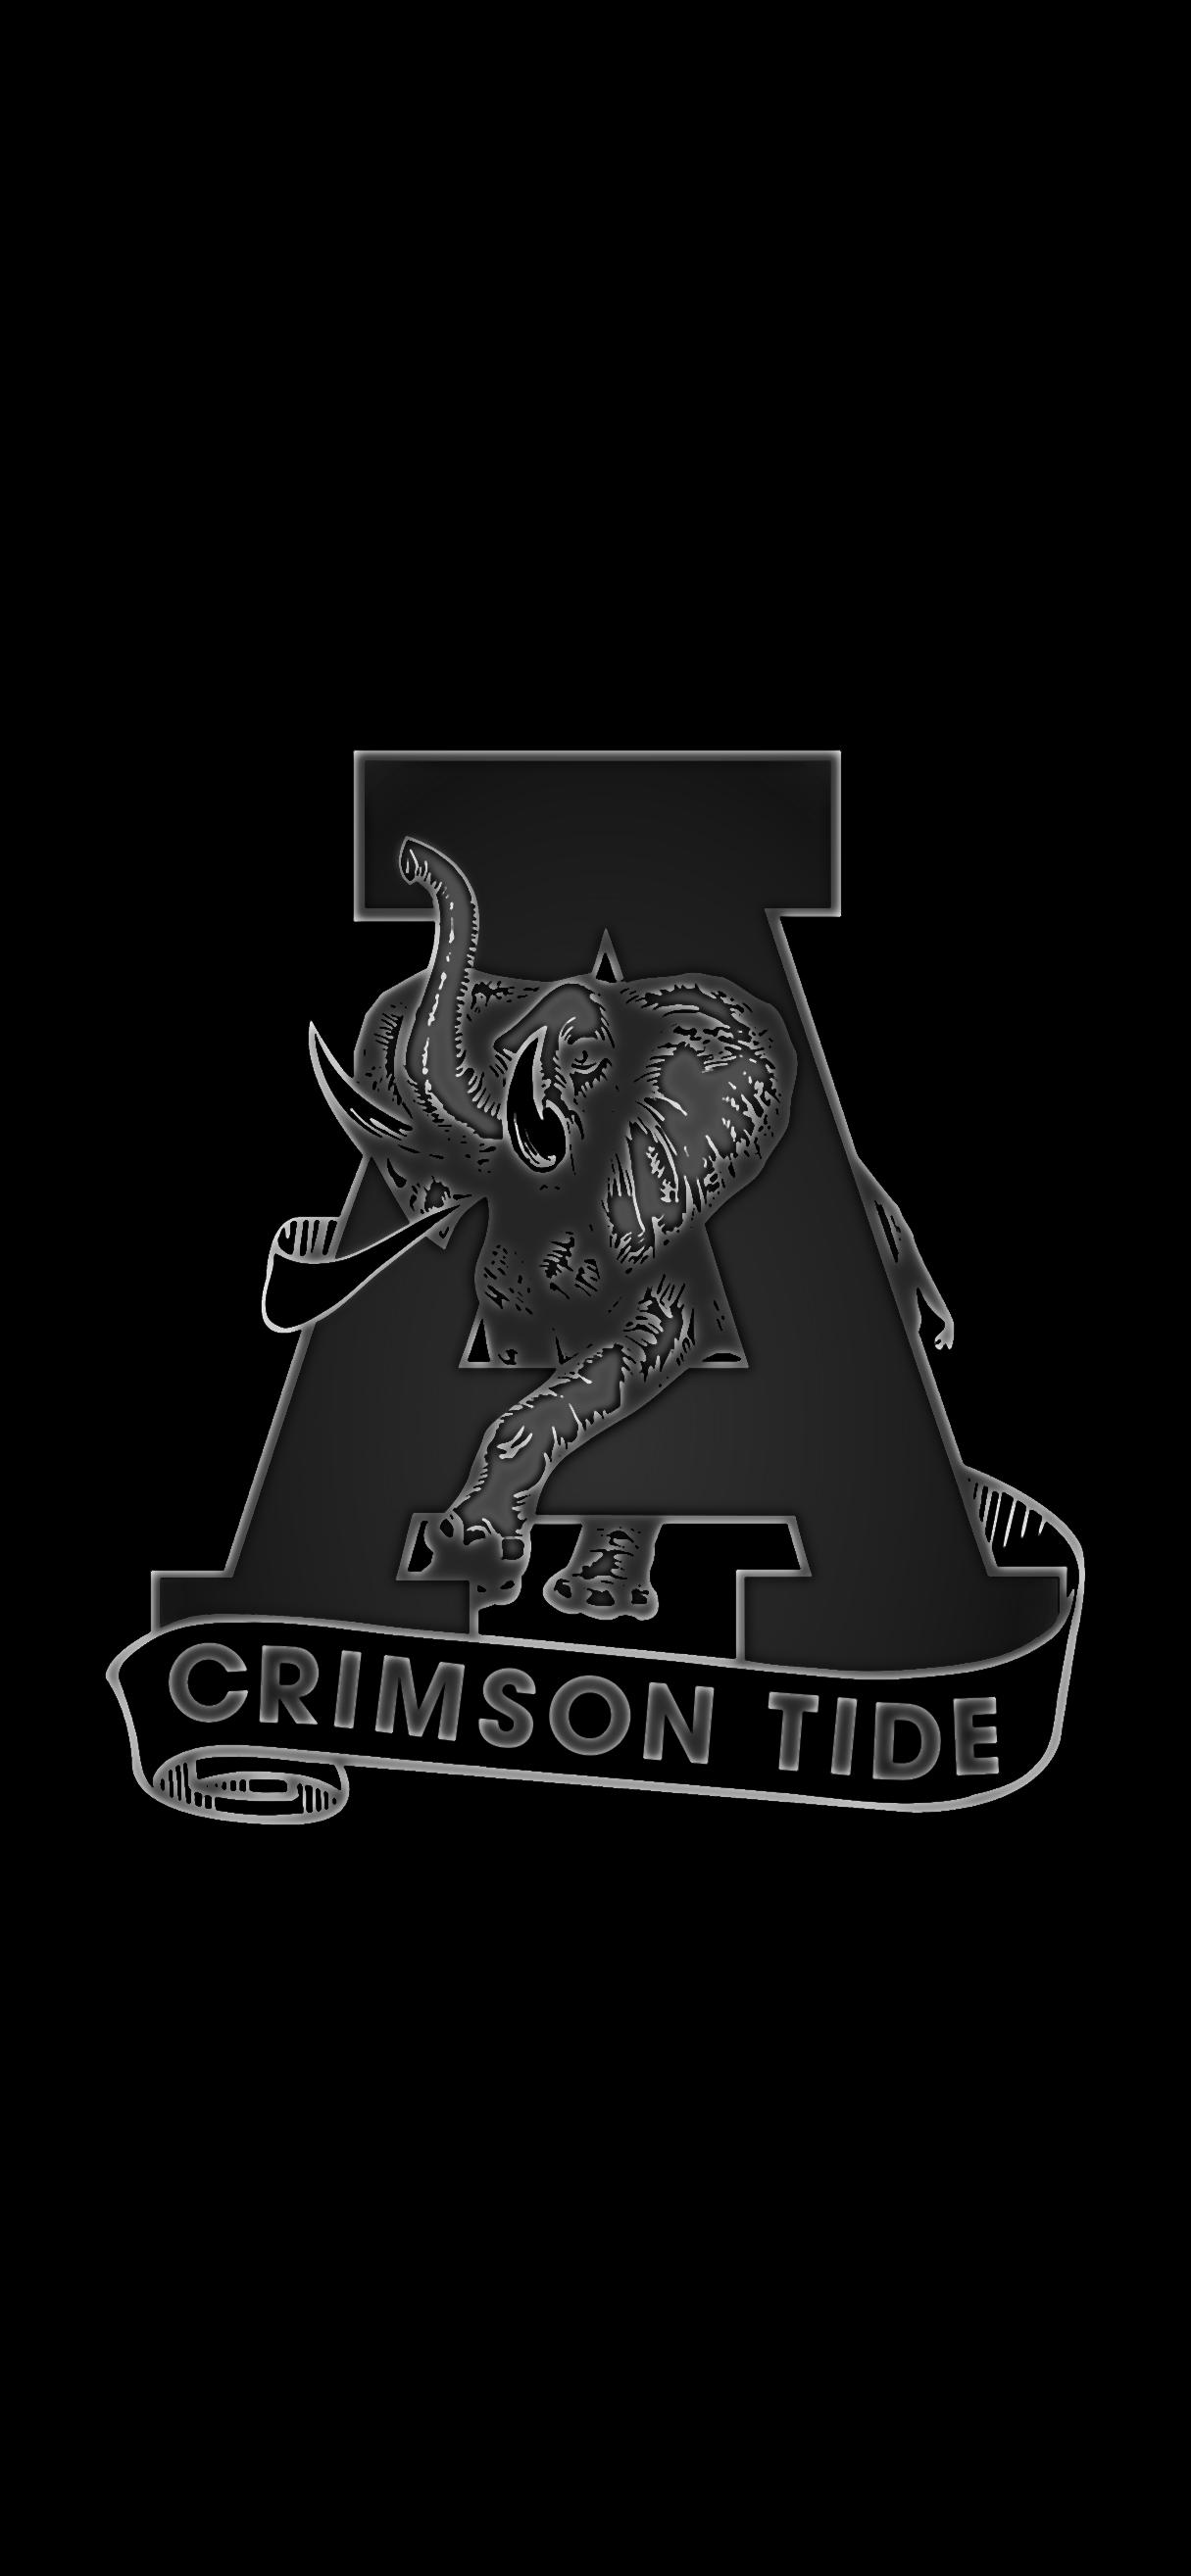 Alabama Crimson Tide Football Wallpaper Iphone Android 22